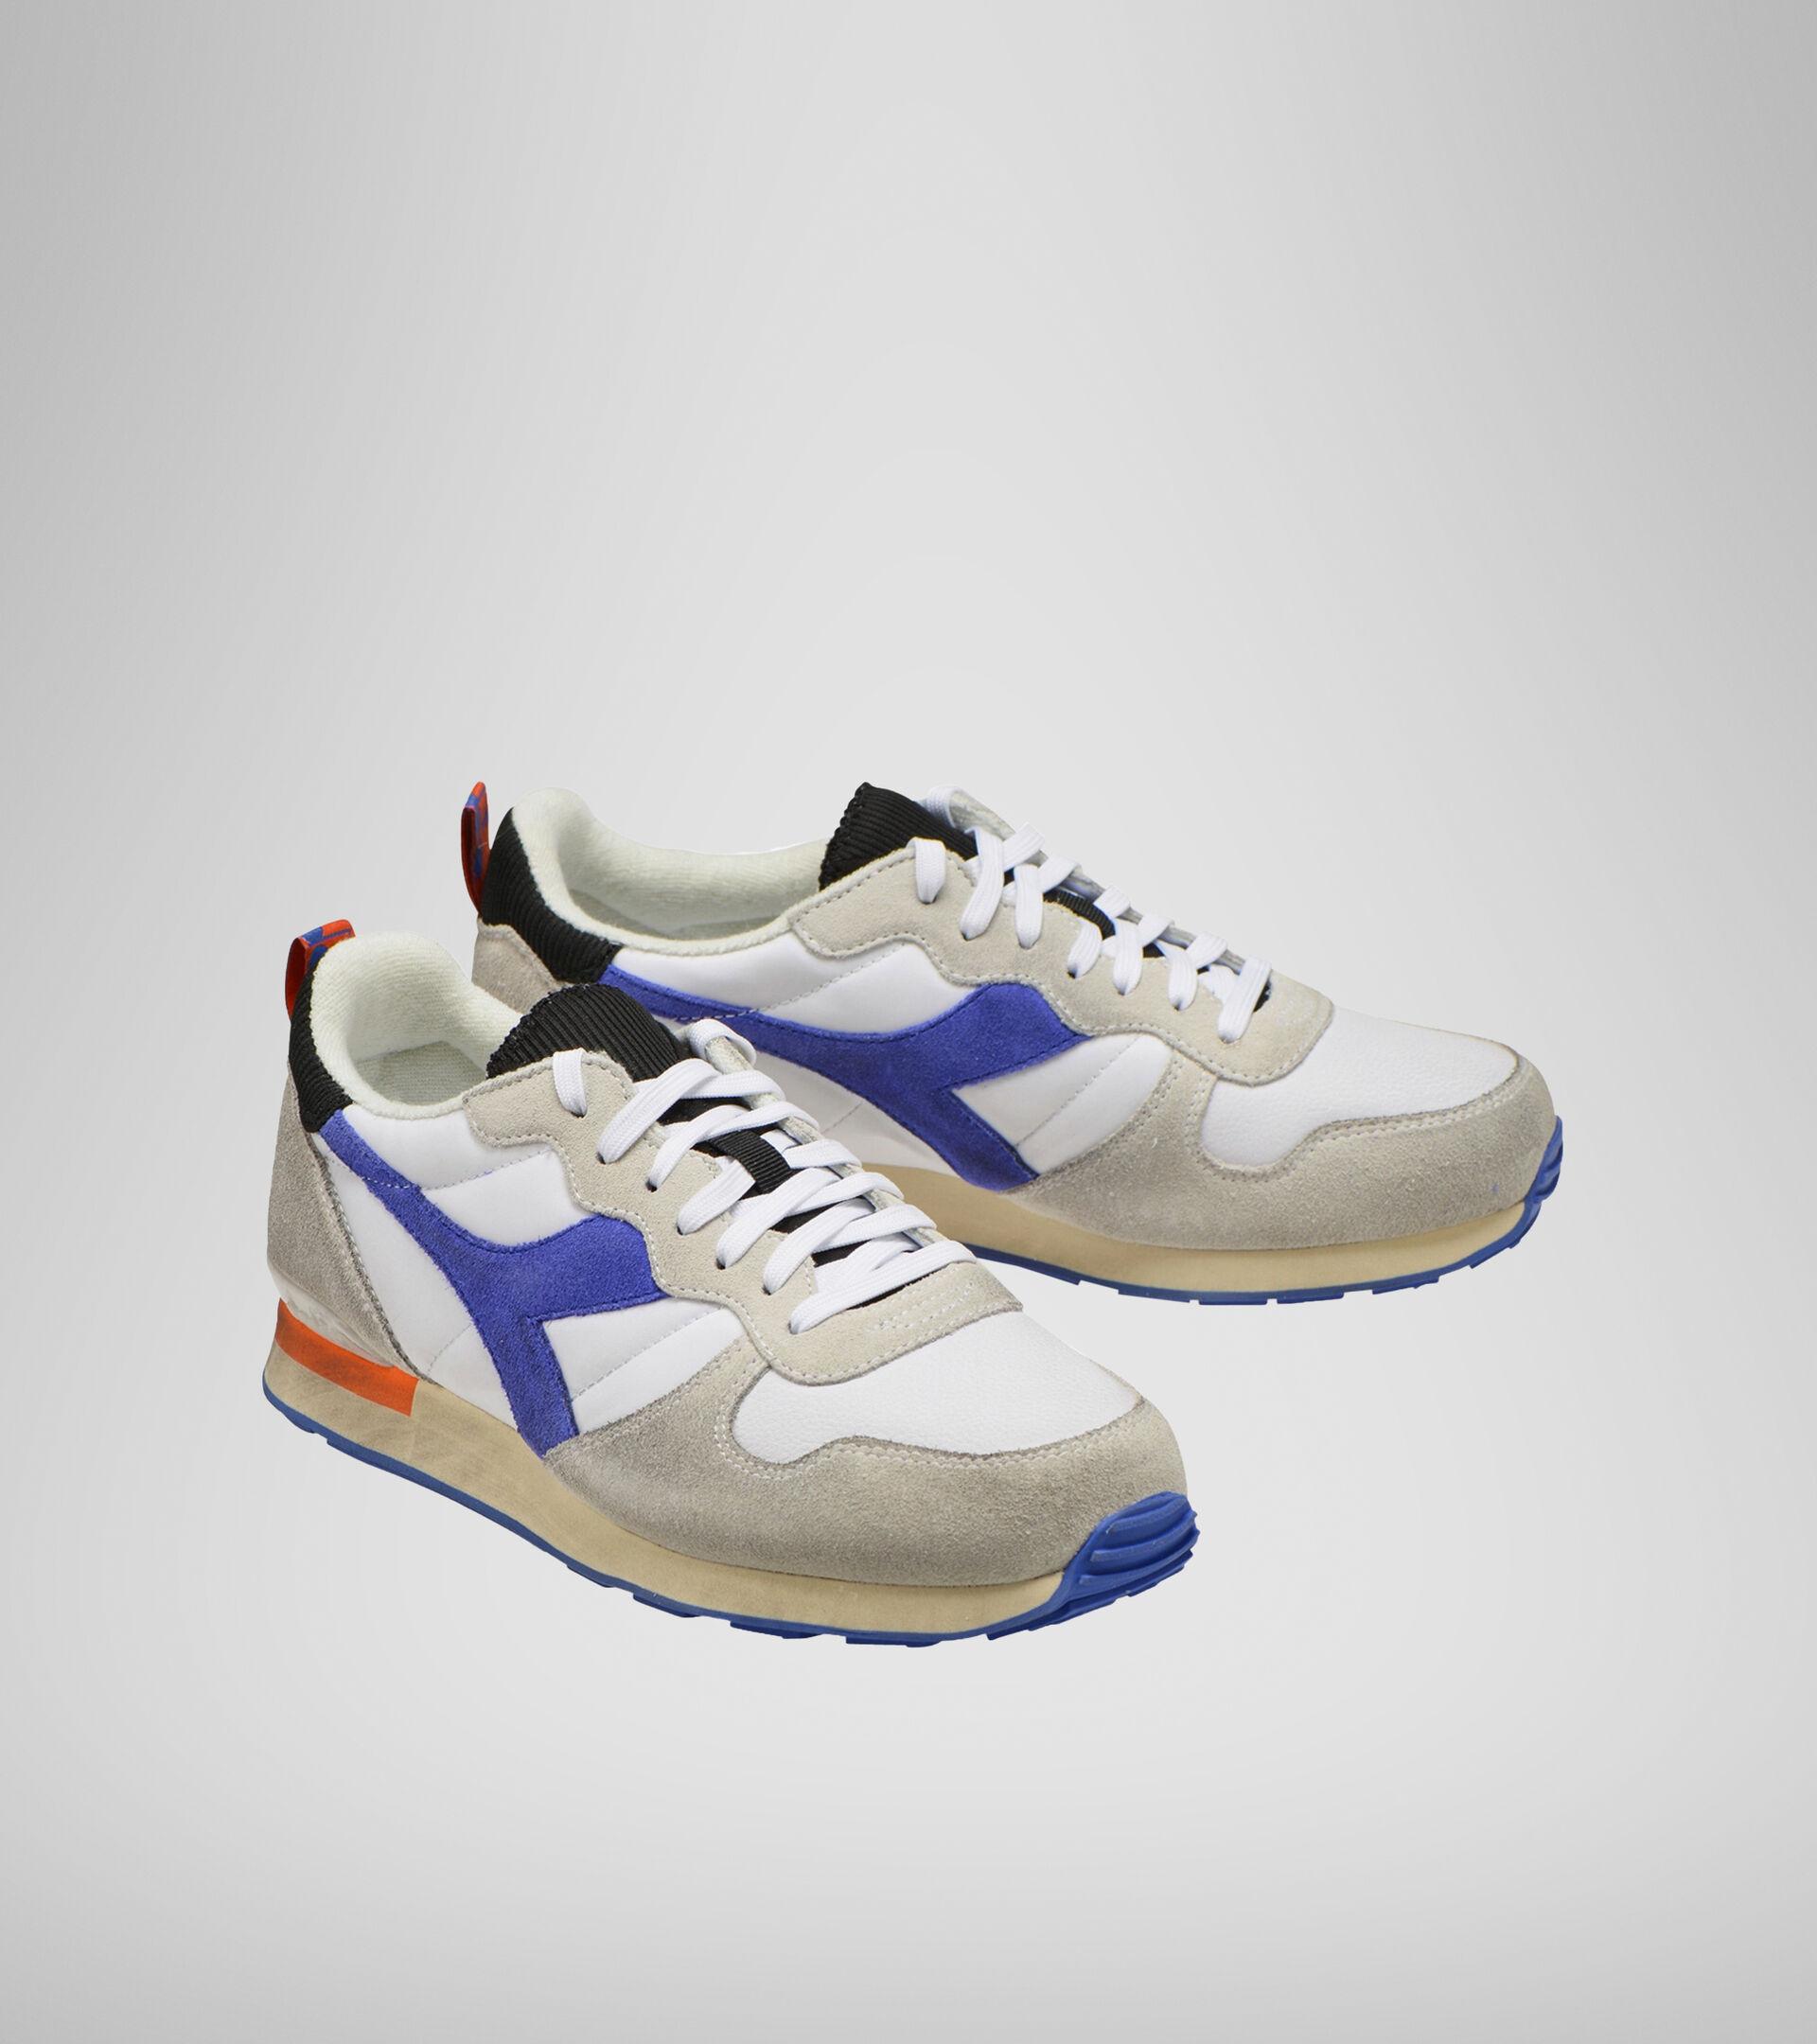 Footwear Sportswear UNISEX CAMARO ICONA BIANCO/BLU PERSIA/ARANCIATA Diadora